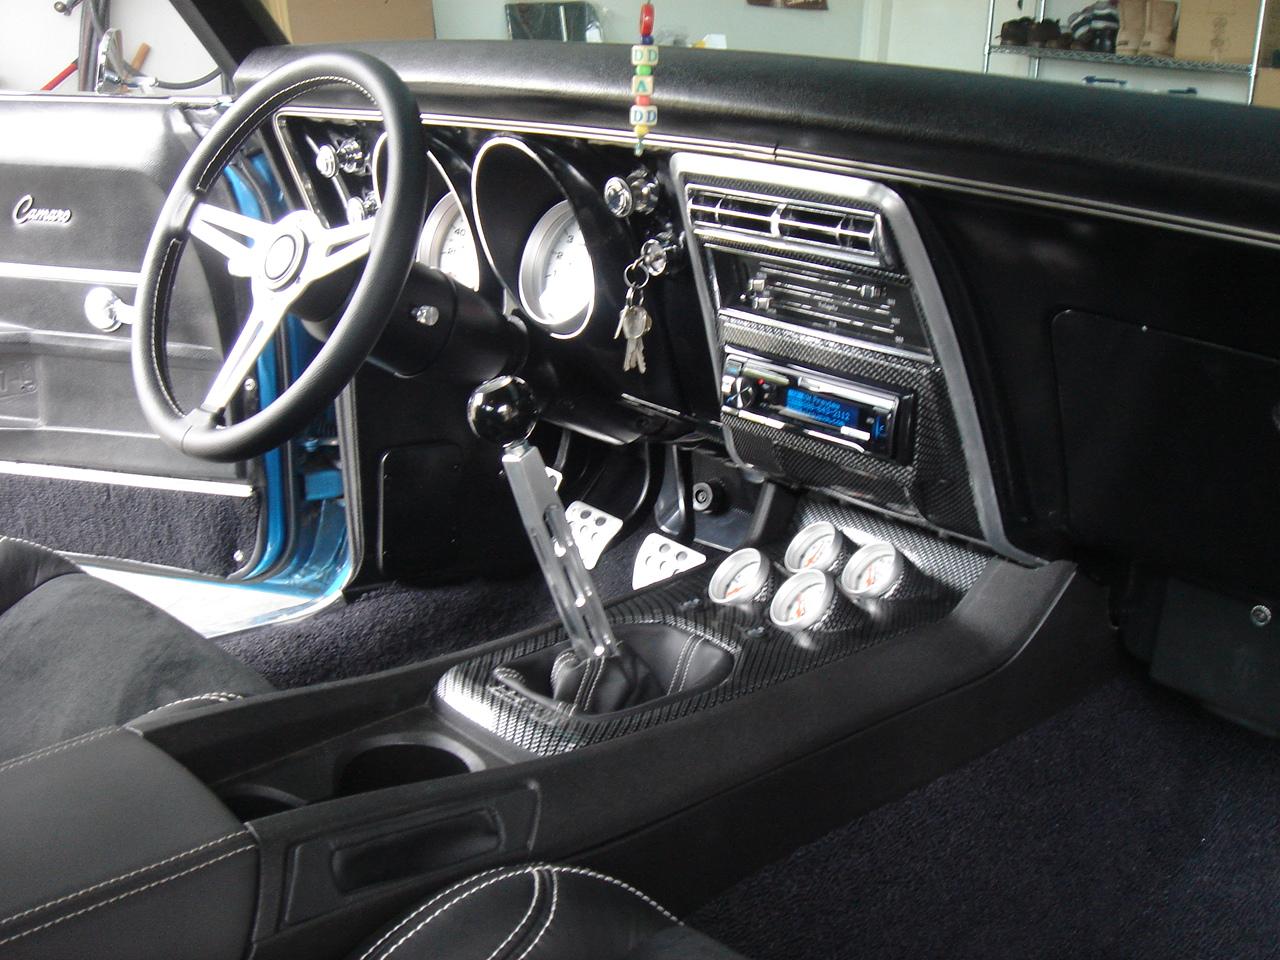 67 Camaro With 5th Gen Center Console